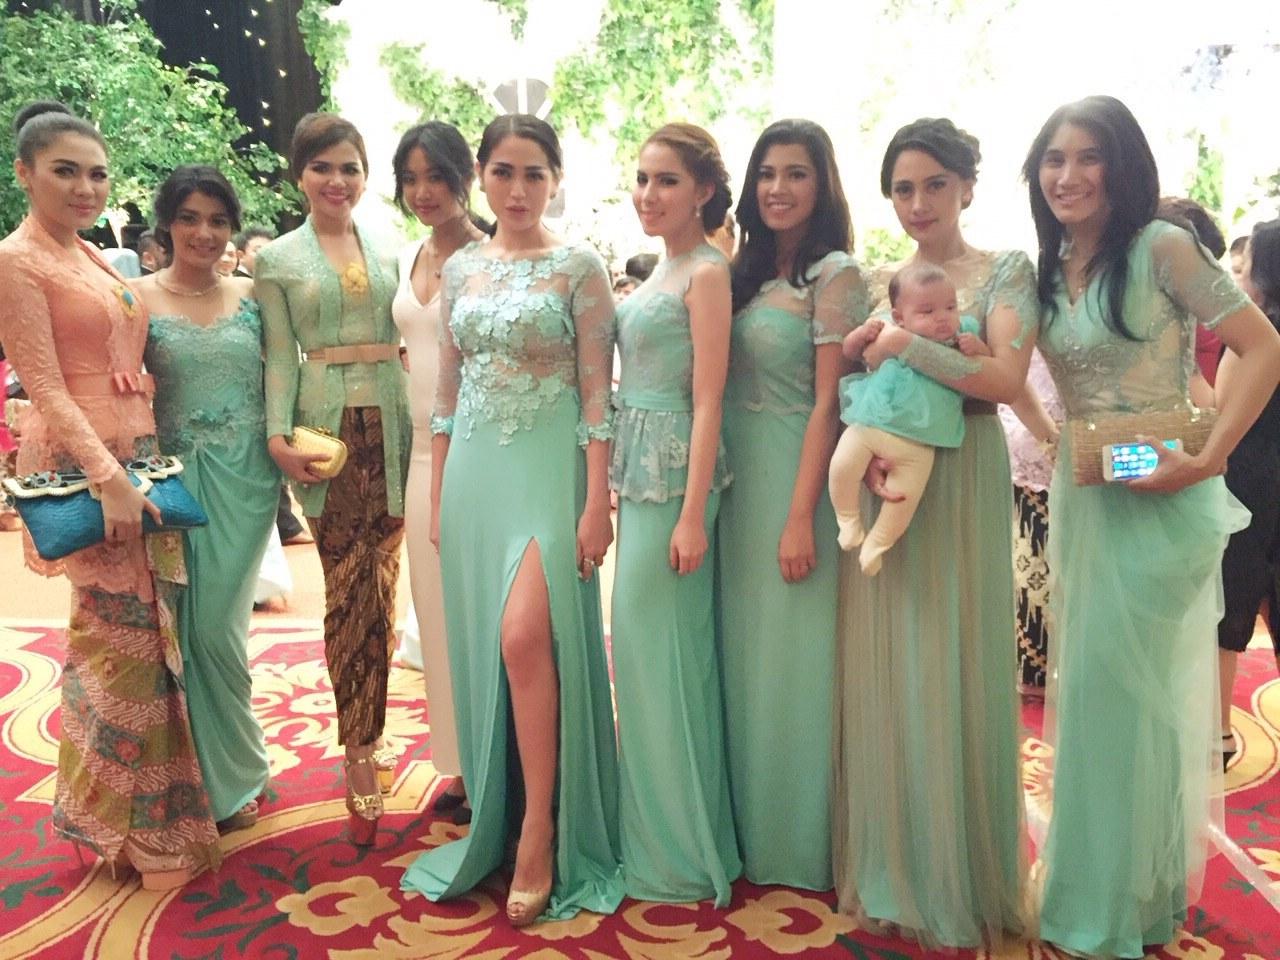 Inspirasi Bridesmaid Indonesia Hijab Budm Party Dress Indonesia – Fashion Dresses